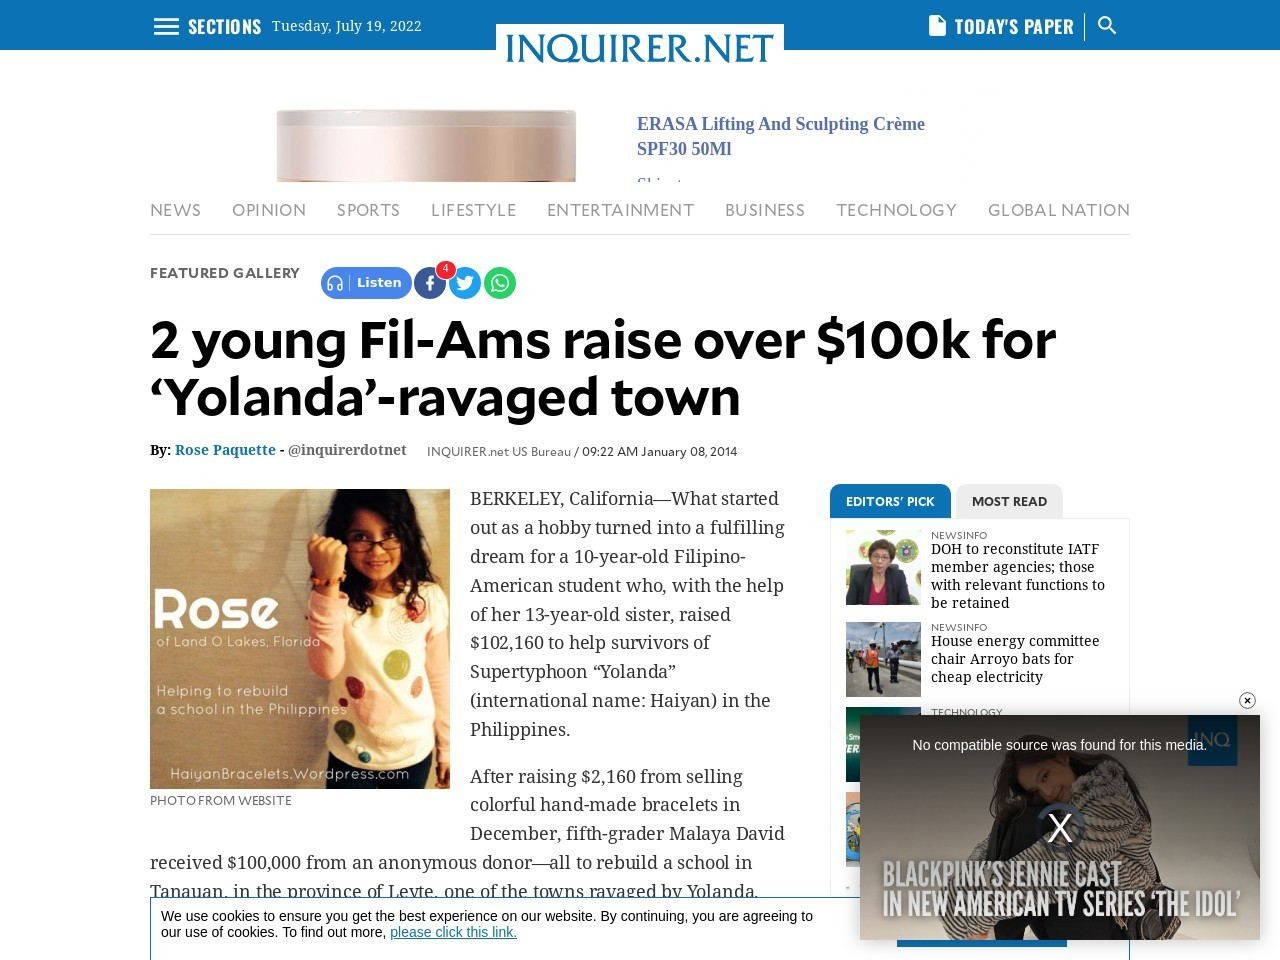 2 young Fil-Am sisters raise more than $100k for 'Yolanda'-ravaged Tanauan